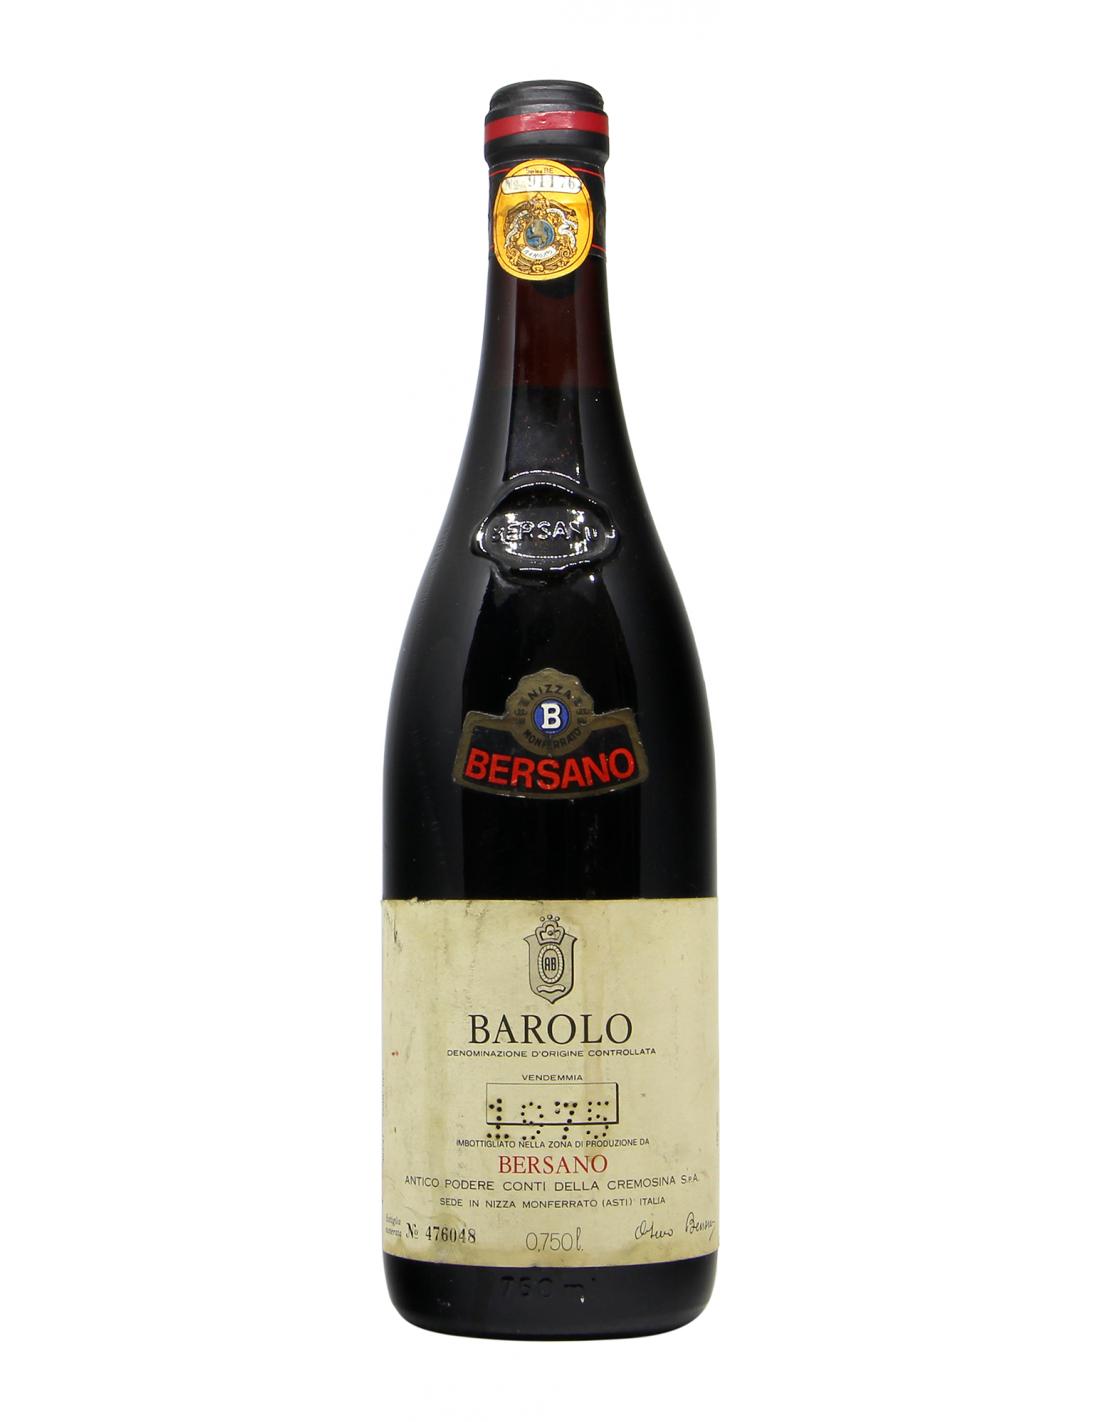 BAROLO 1975 BERSANO Grandi Bottiglie